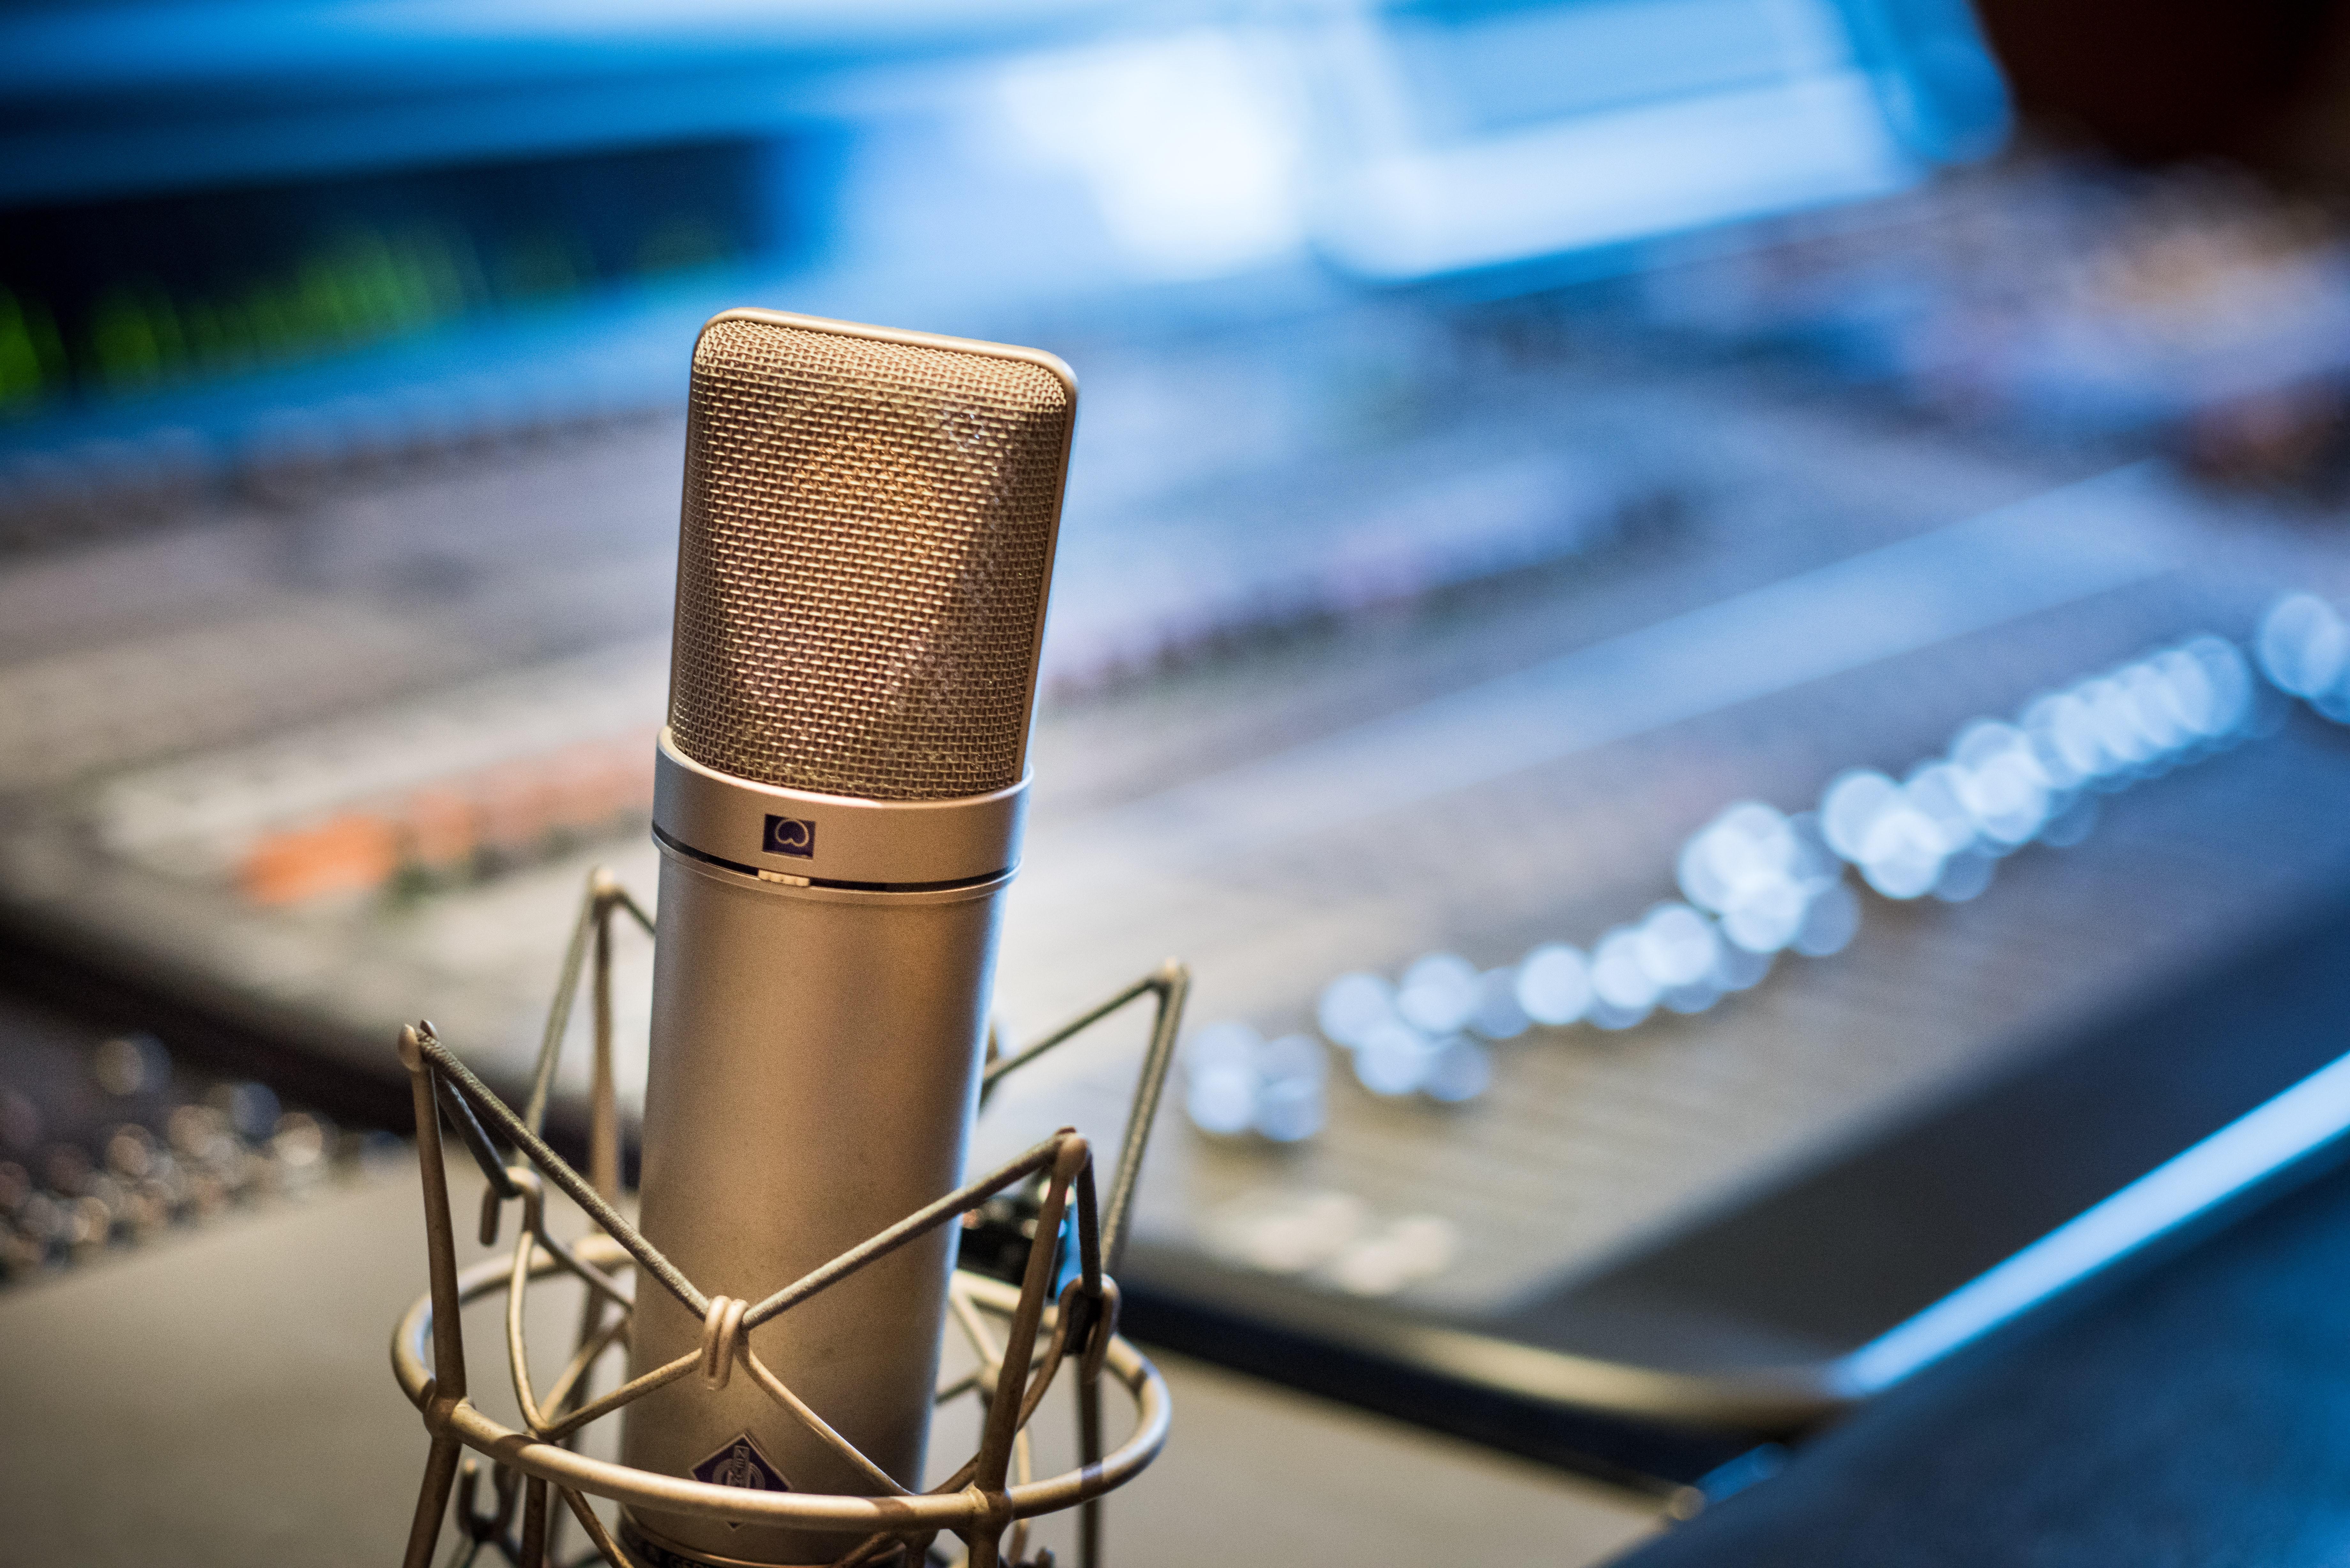 Microfono de segunda mano en venta